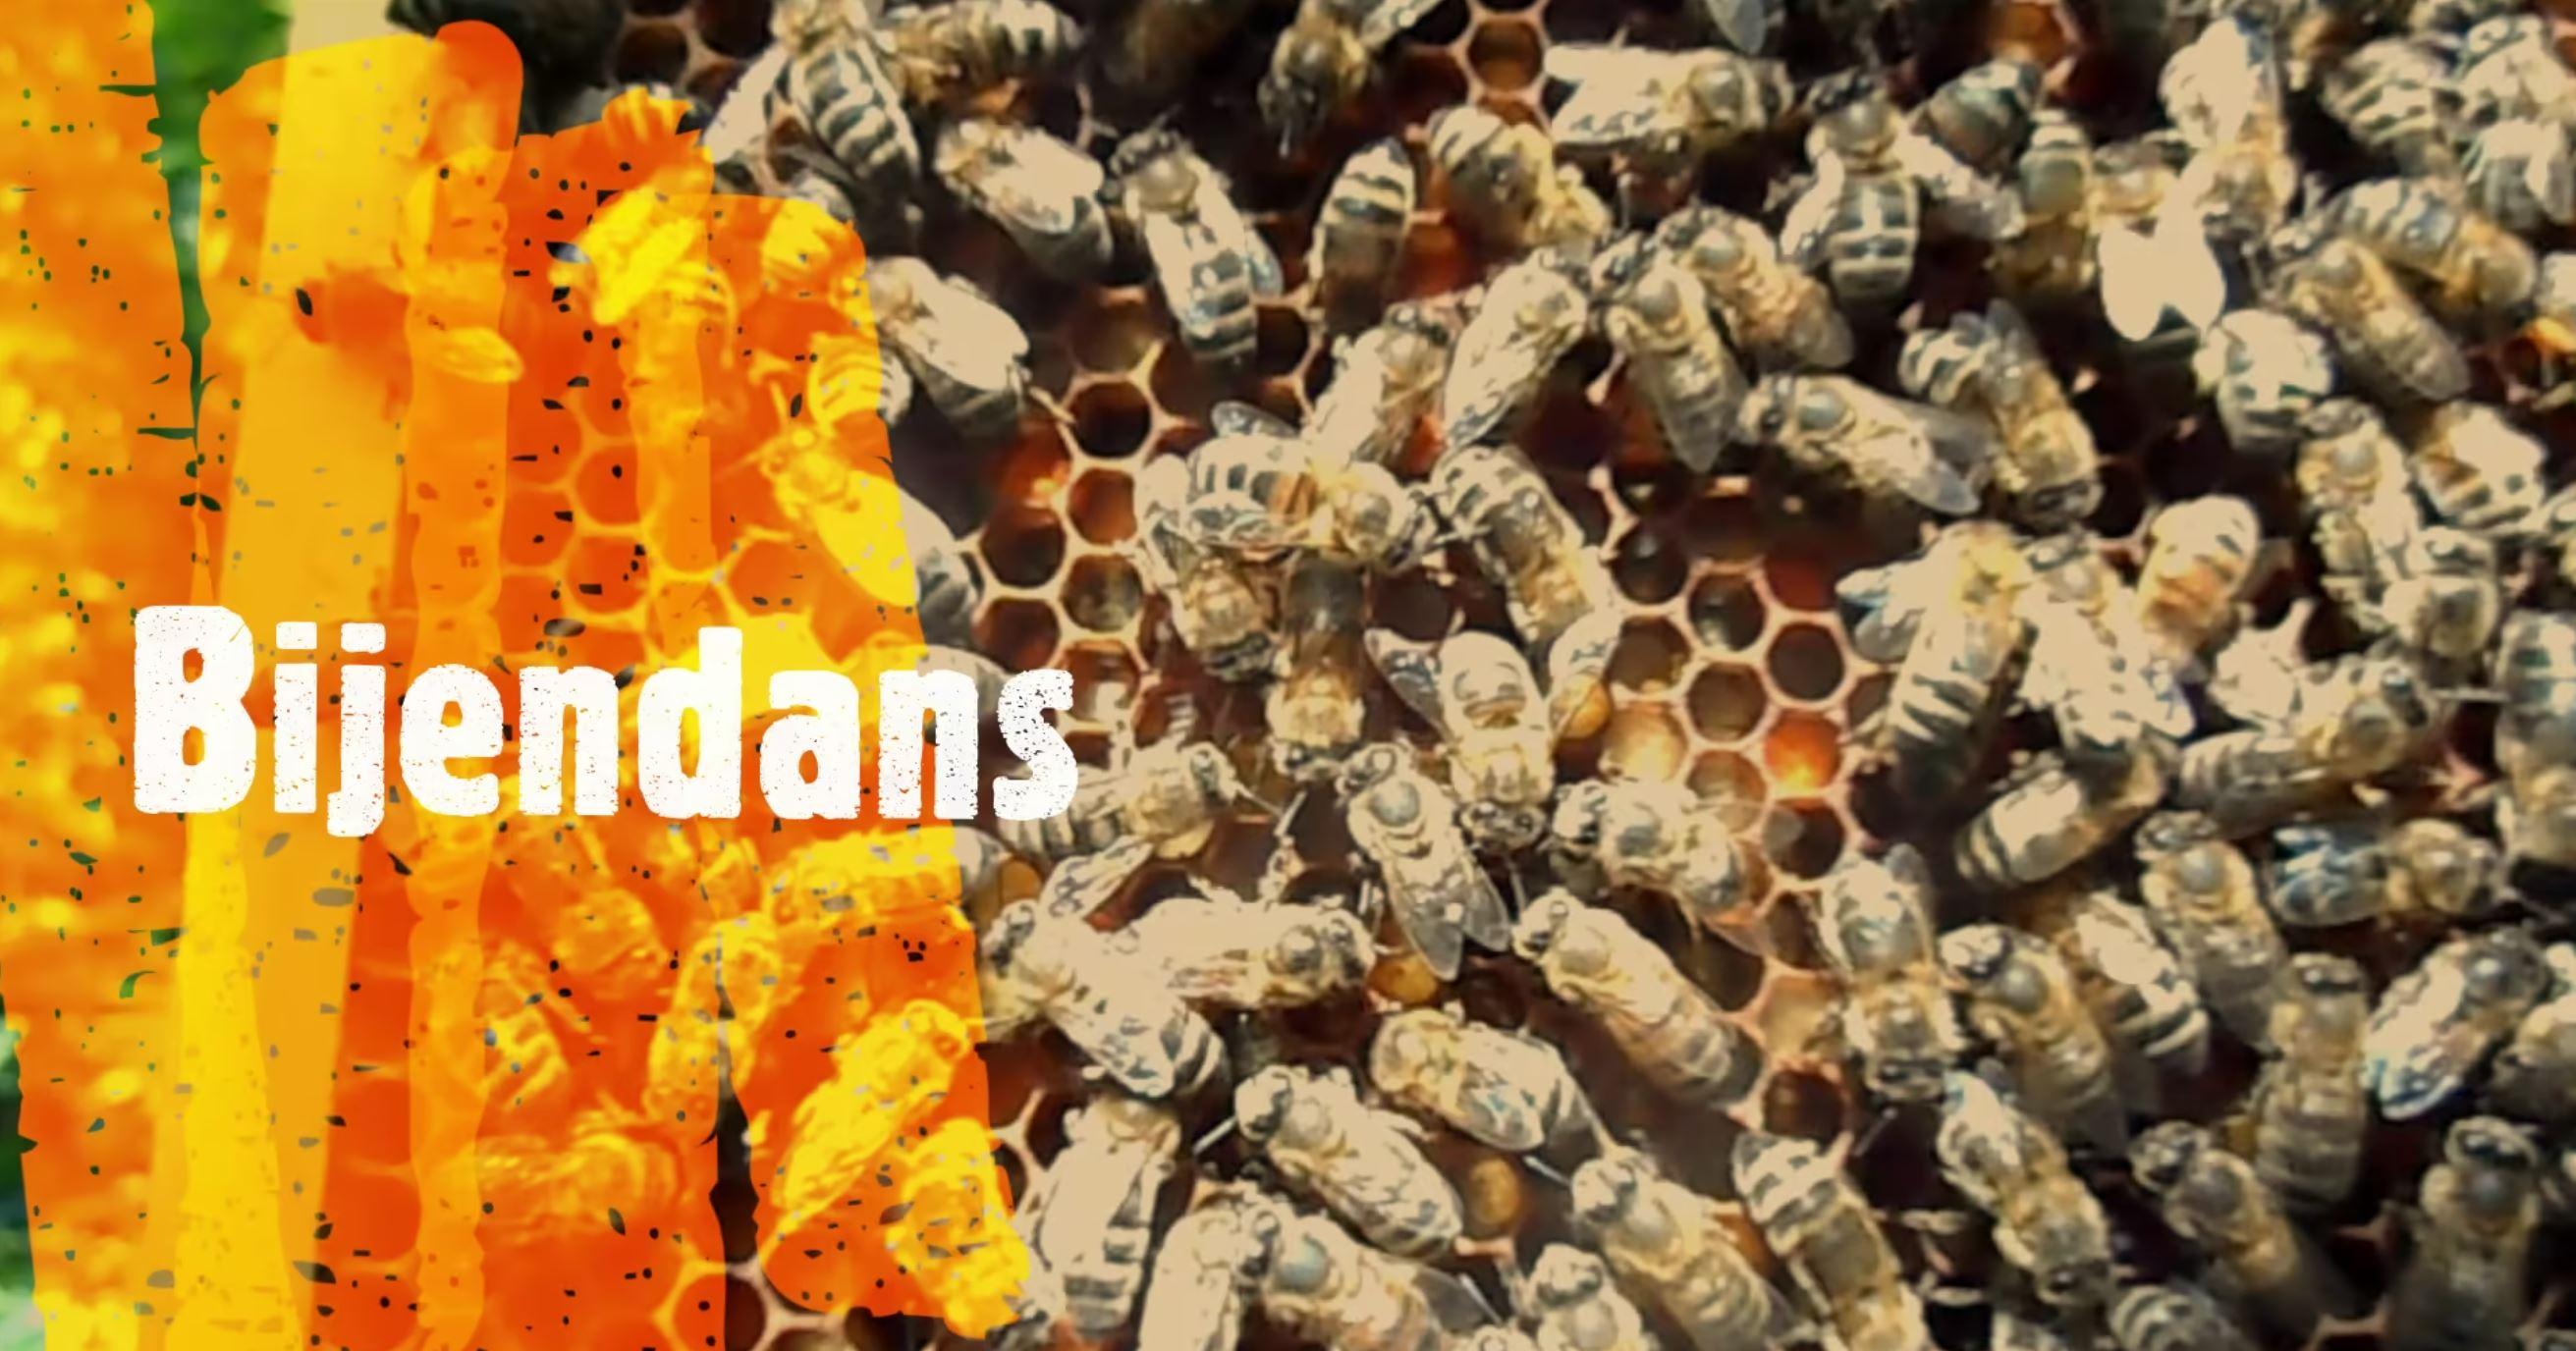 BEE IN BALANCE WEETJES - DE BIJENDANS